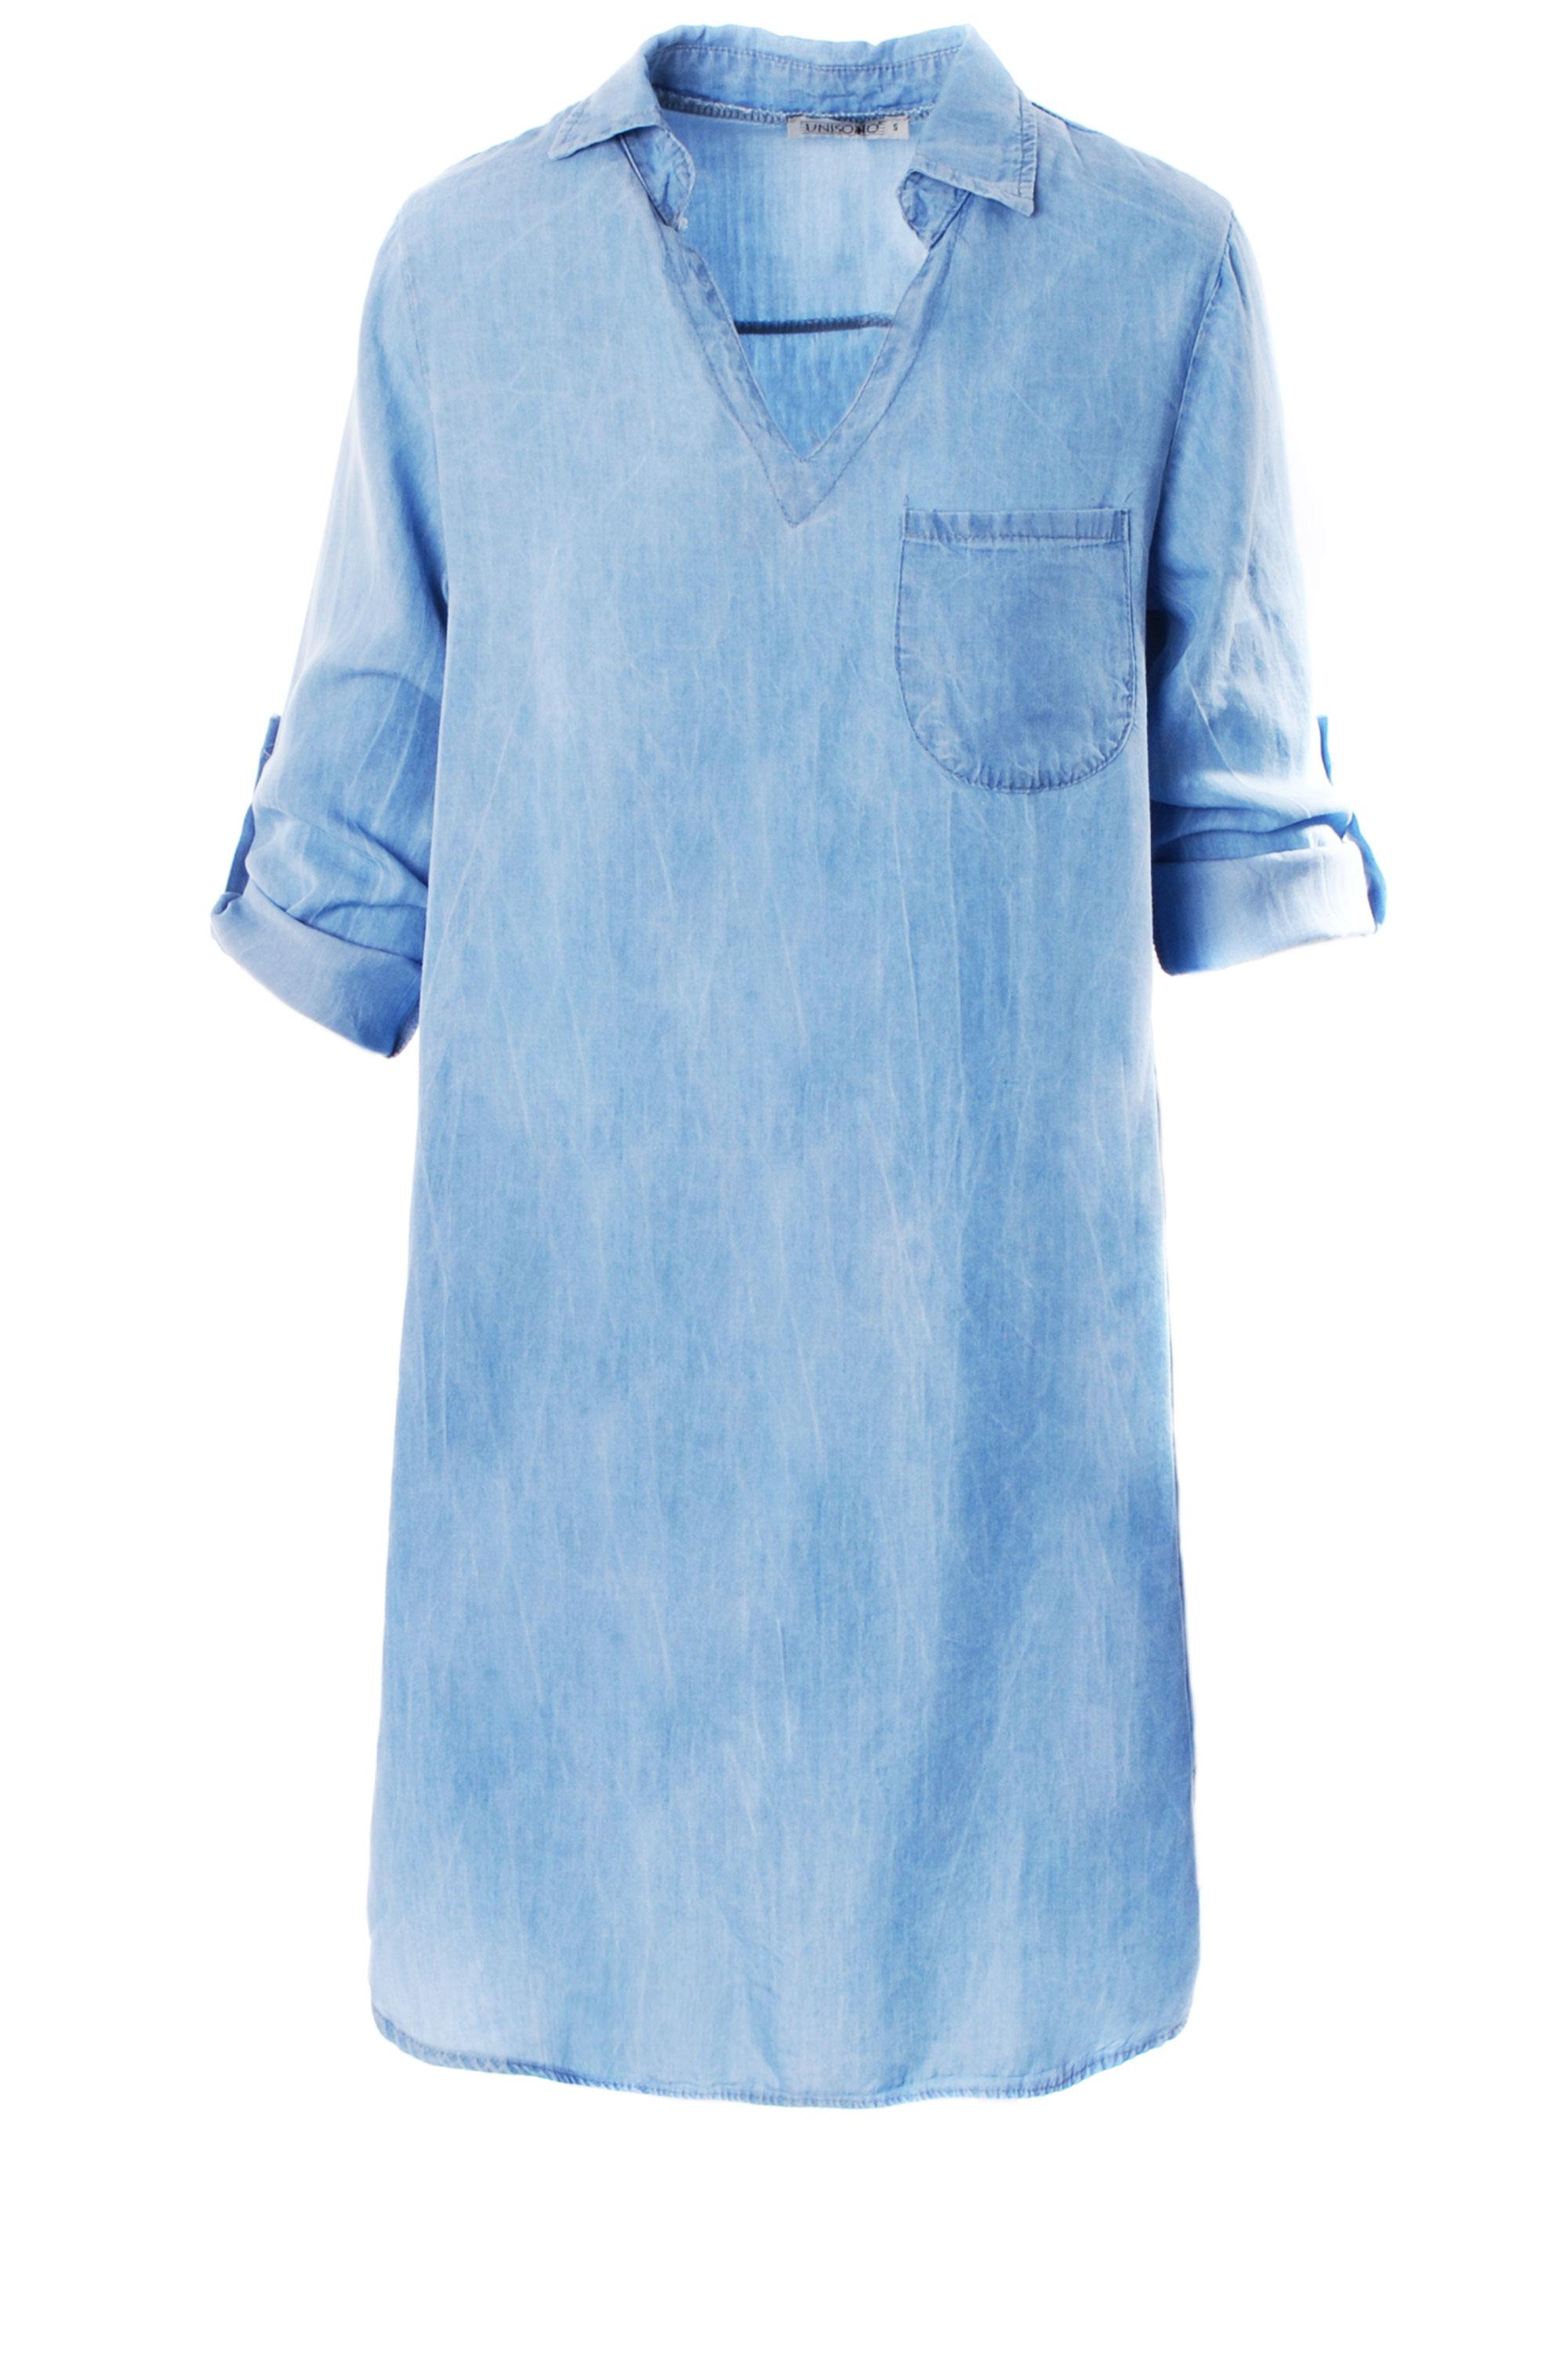 Koszula - 138-1028 JECH - Unisono